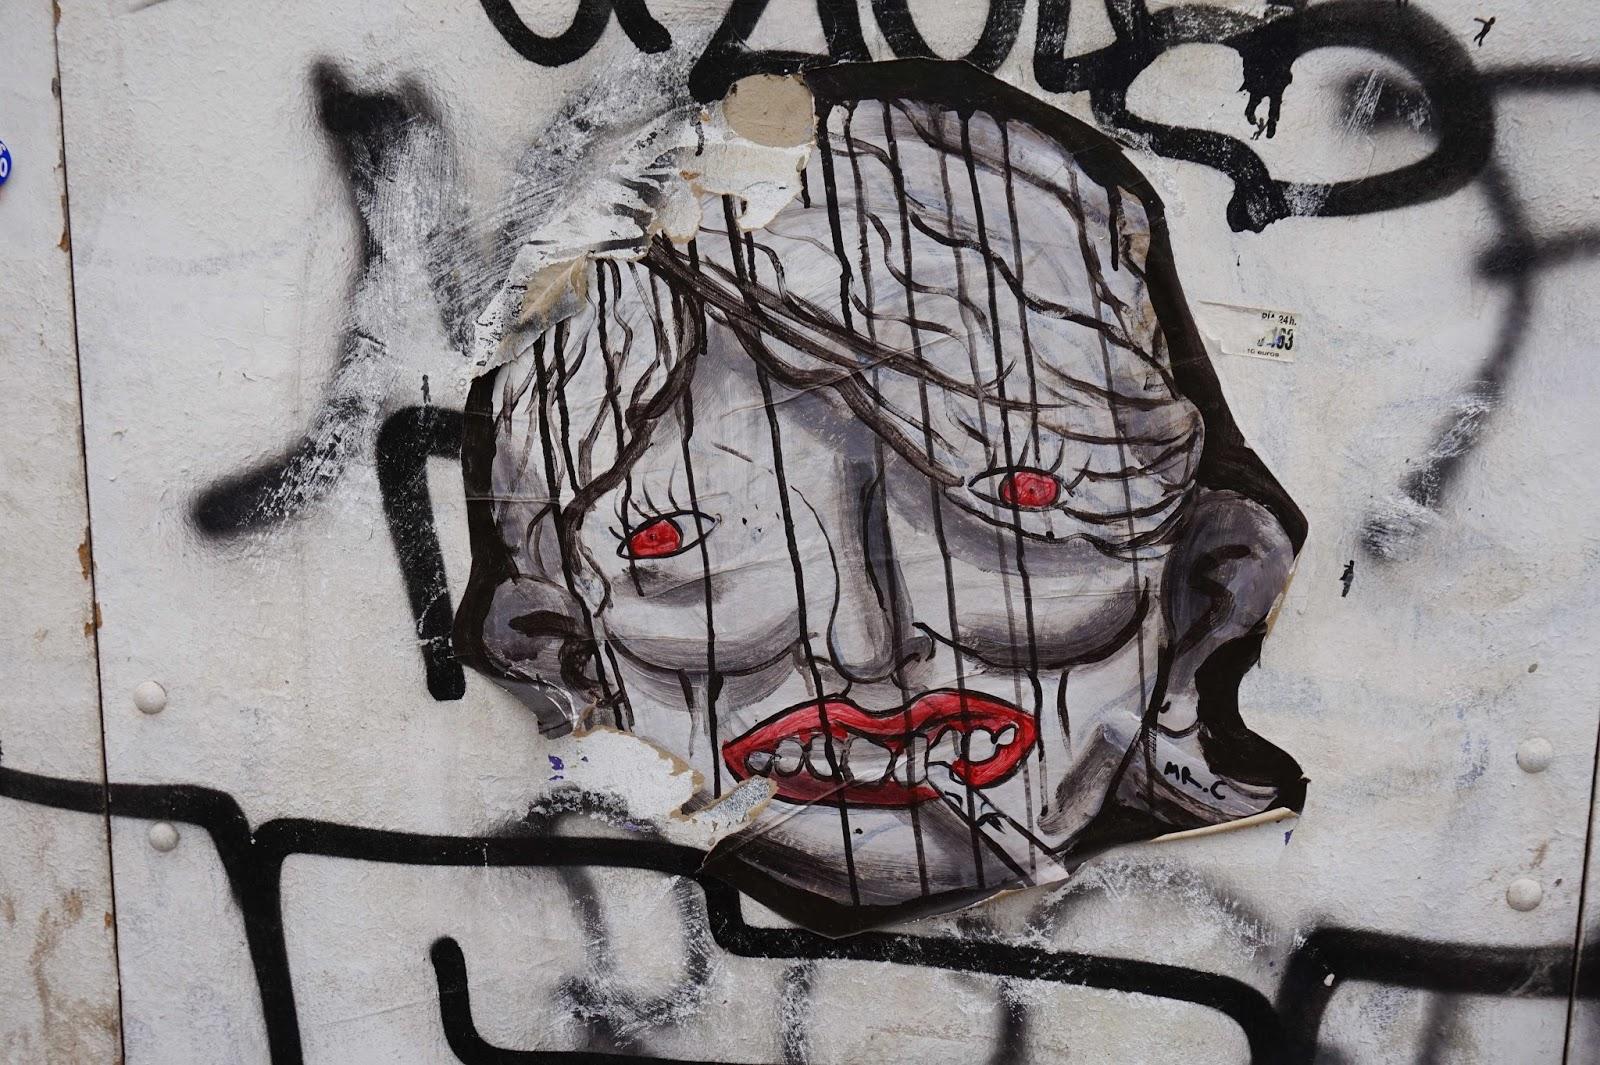 creepy women smoking, barcelona street art